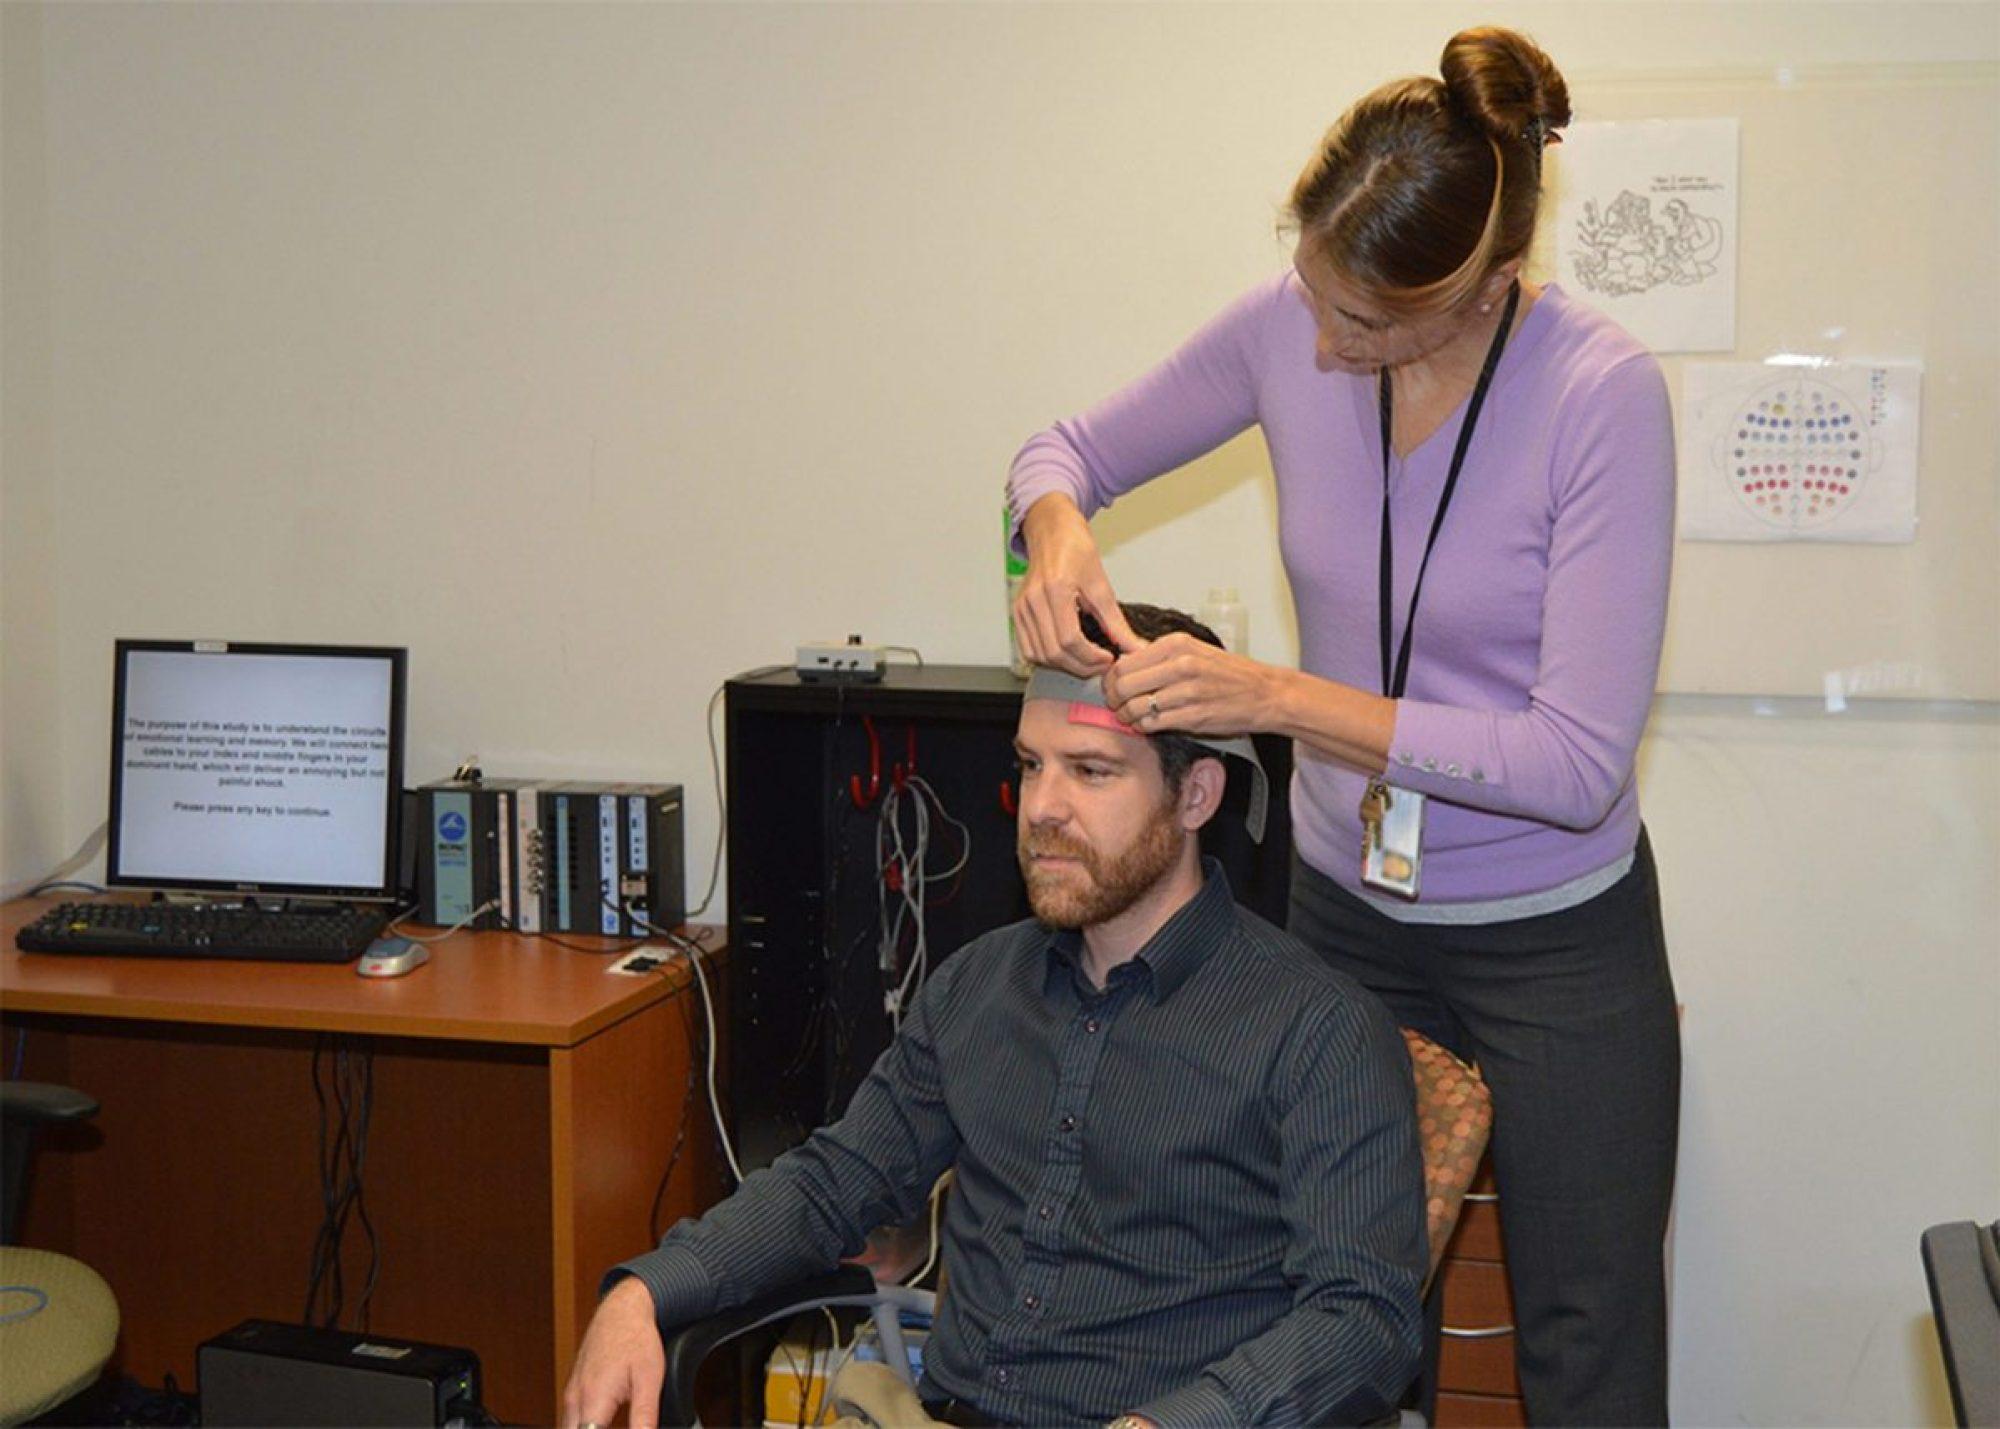 CfNN investigators demonstrate transcranial direct current stimulation tDCS